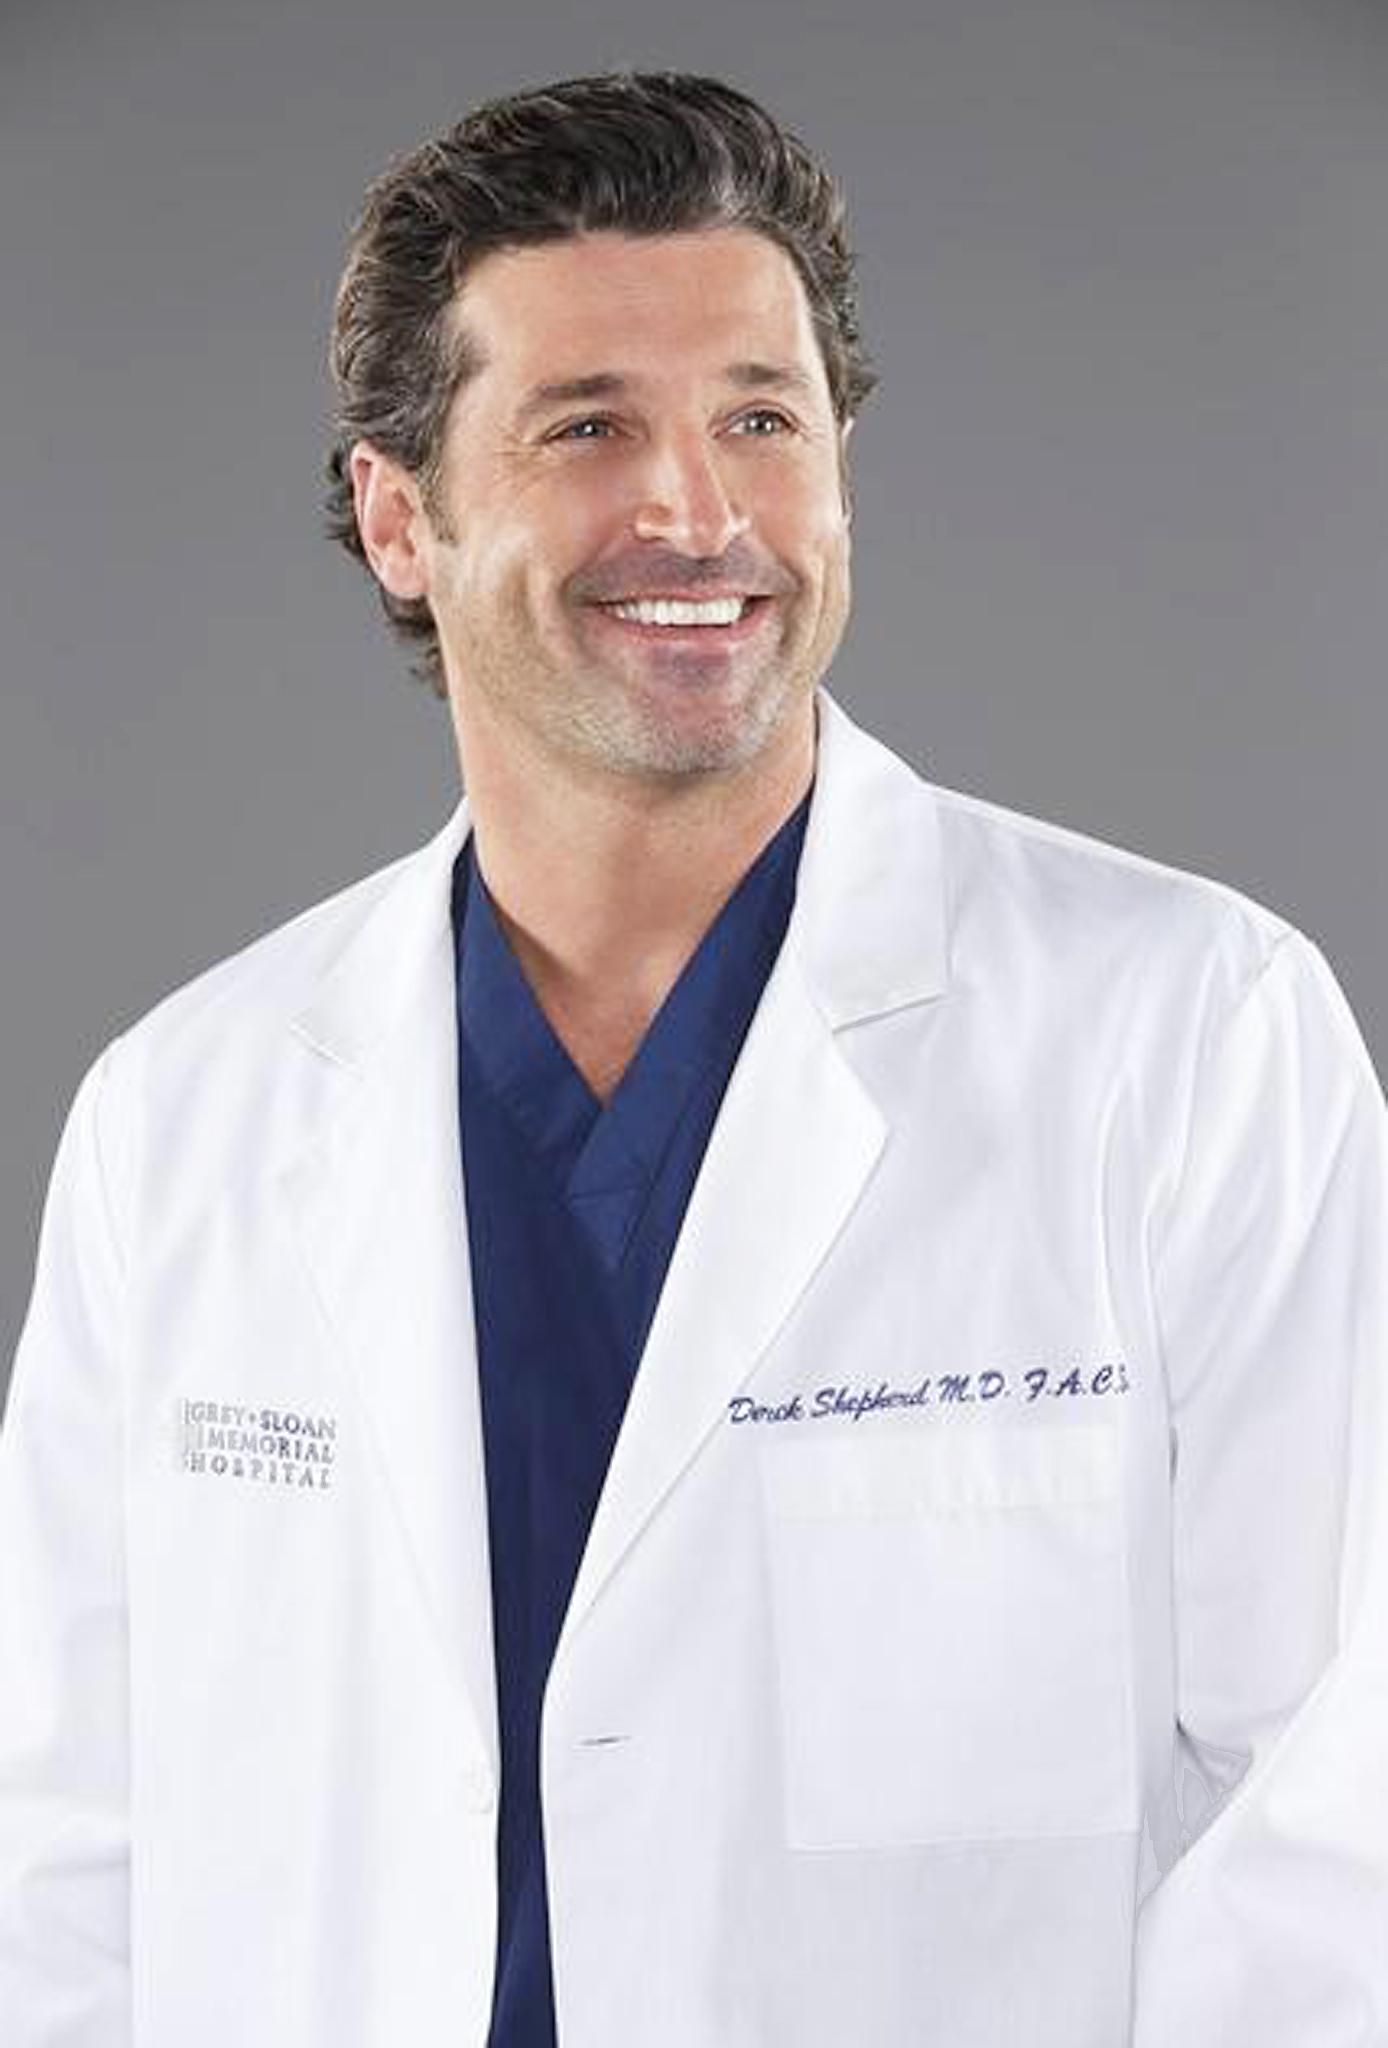 Greys-Anatomy-Audition-Patrick-Dempsey1.jpg